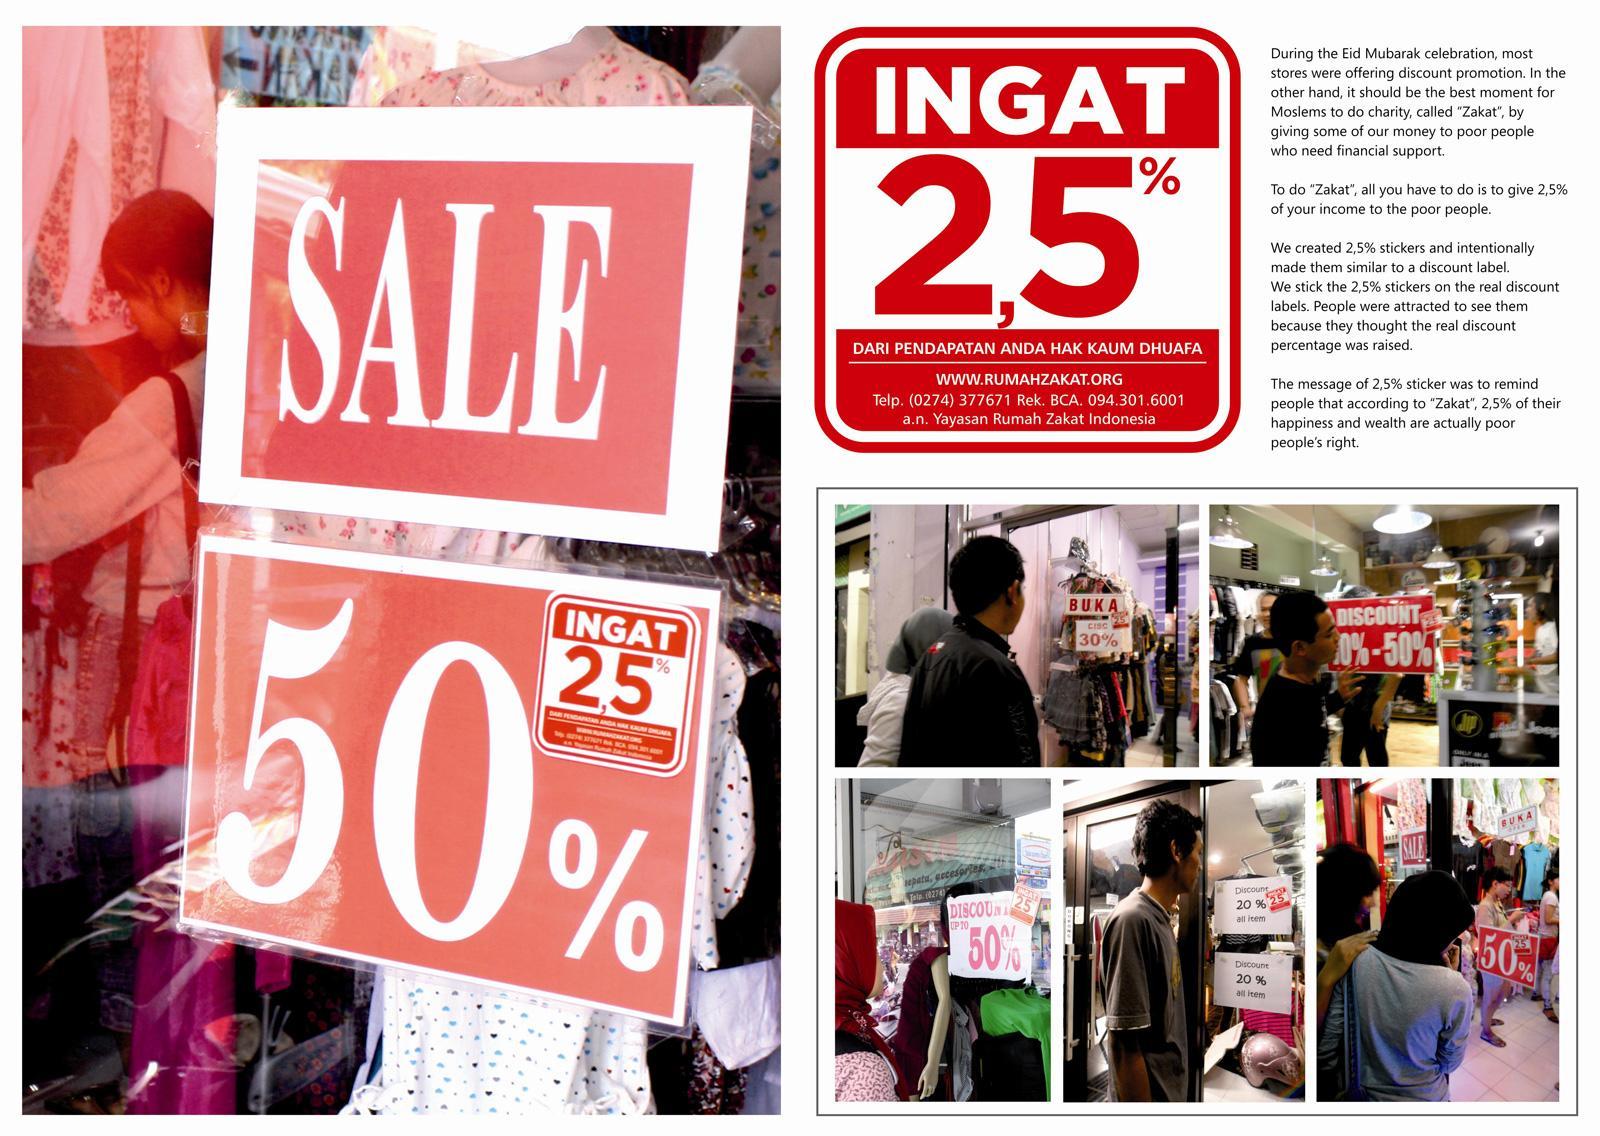 Rumah Zakat Ambient Ad -  Discount 2.5%